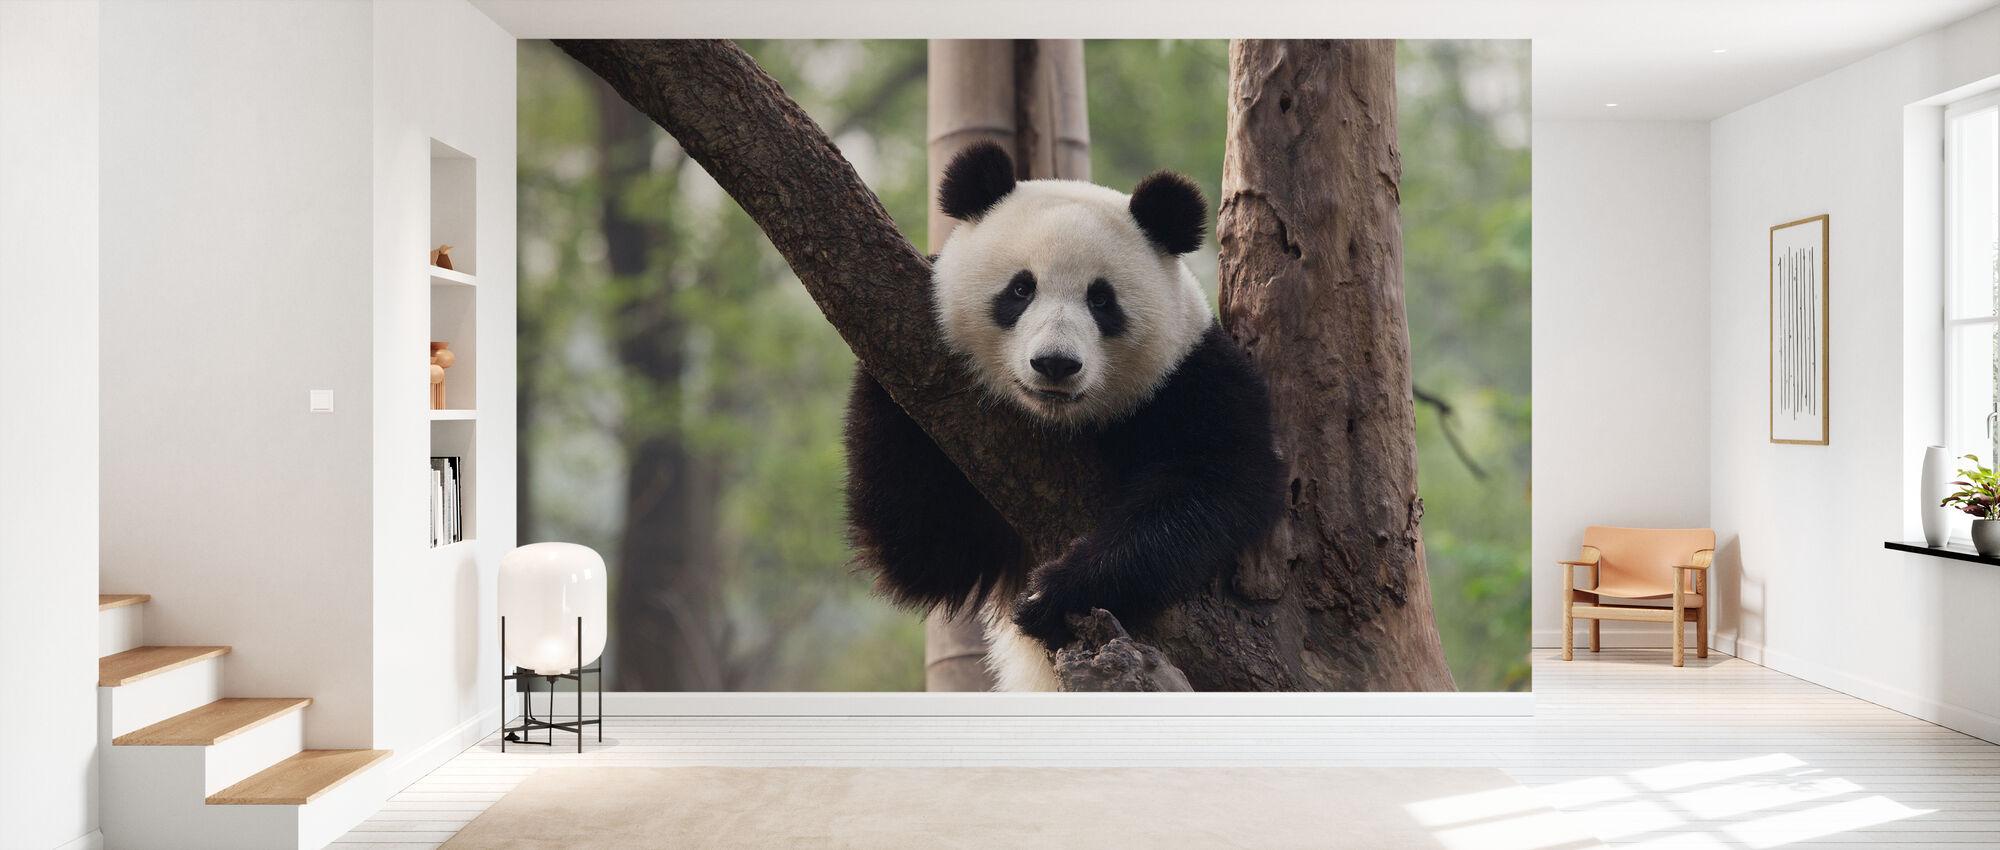 Sweet Panda - Wallpaper - Hallway